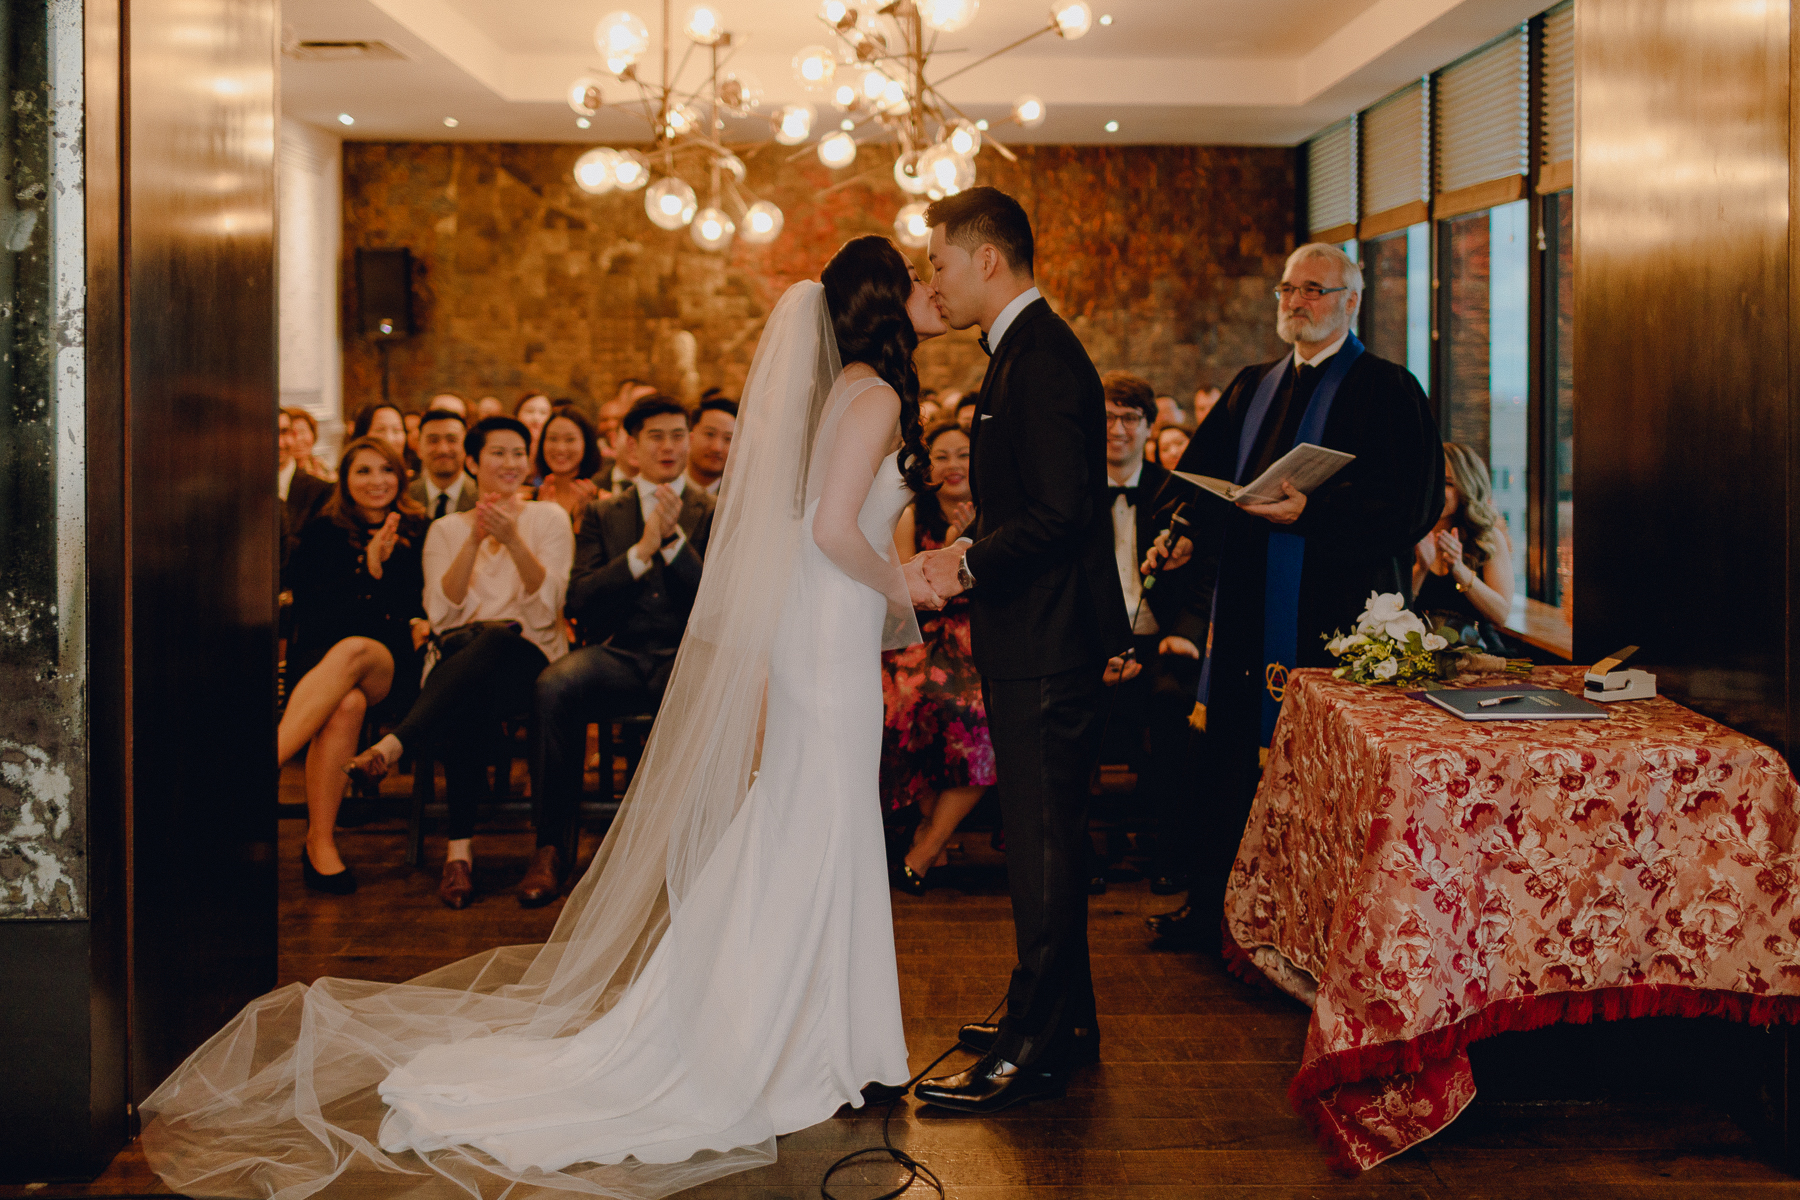 cannoe-restaurannt-wedding 0057.jpg